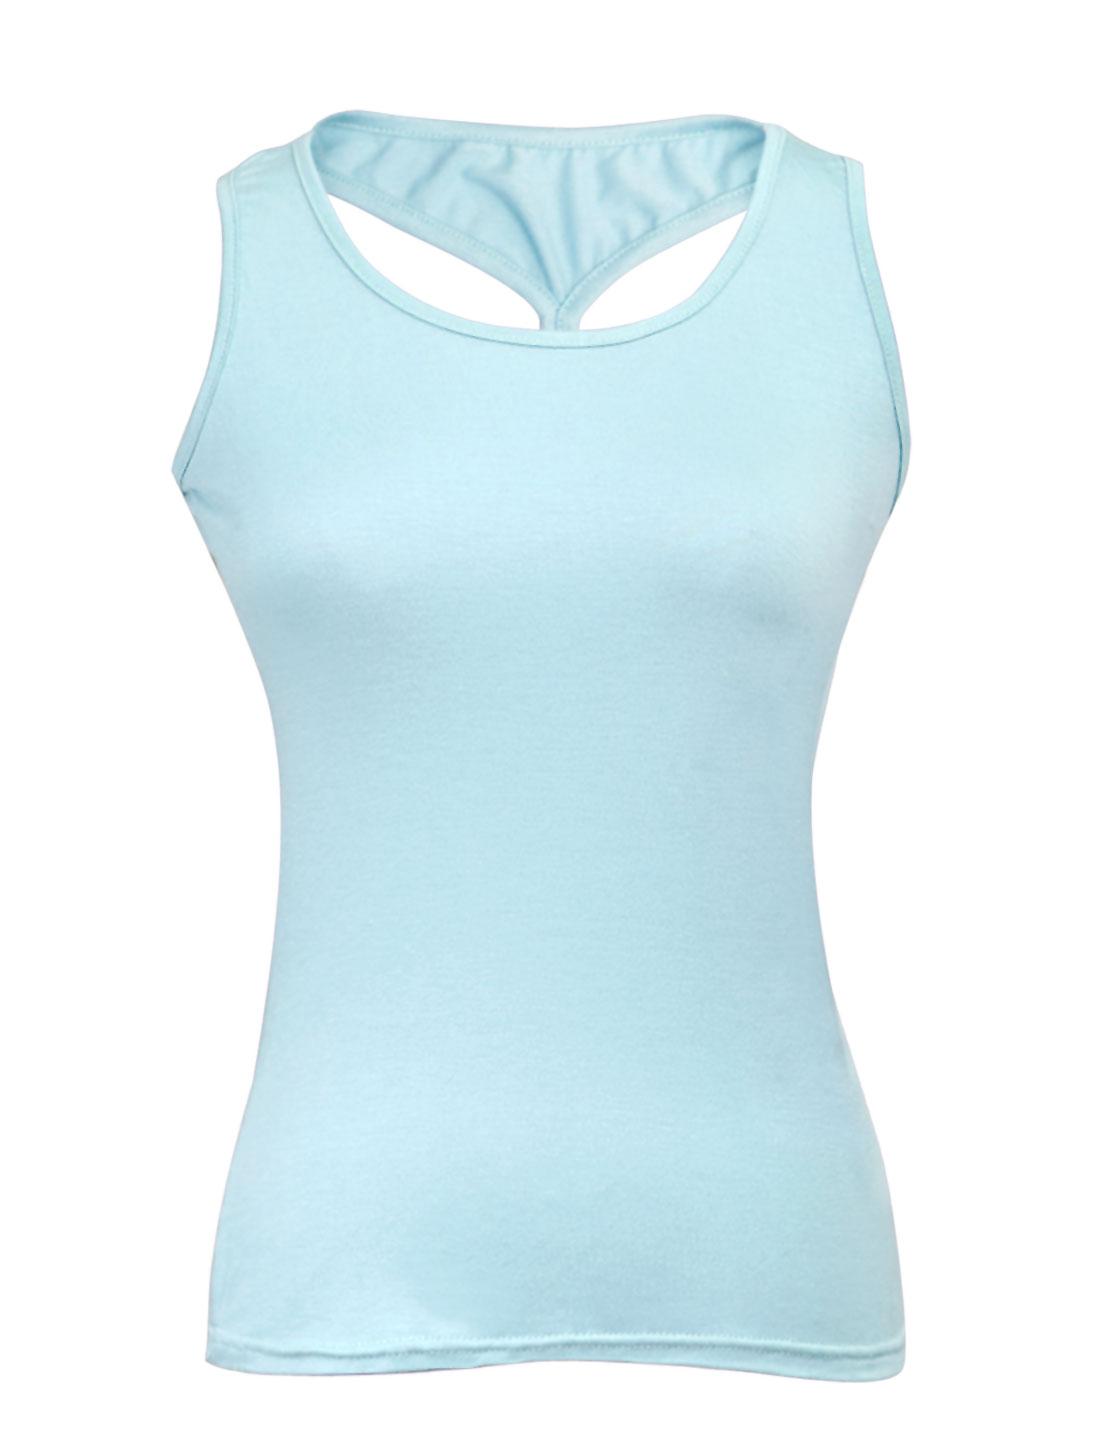 Lady Sweet Style U Neck Slipover Tank Top Light Blue XS